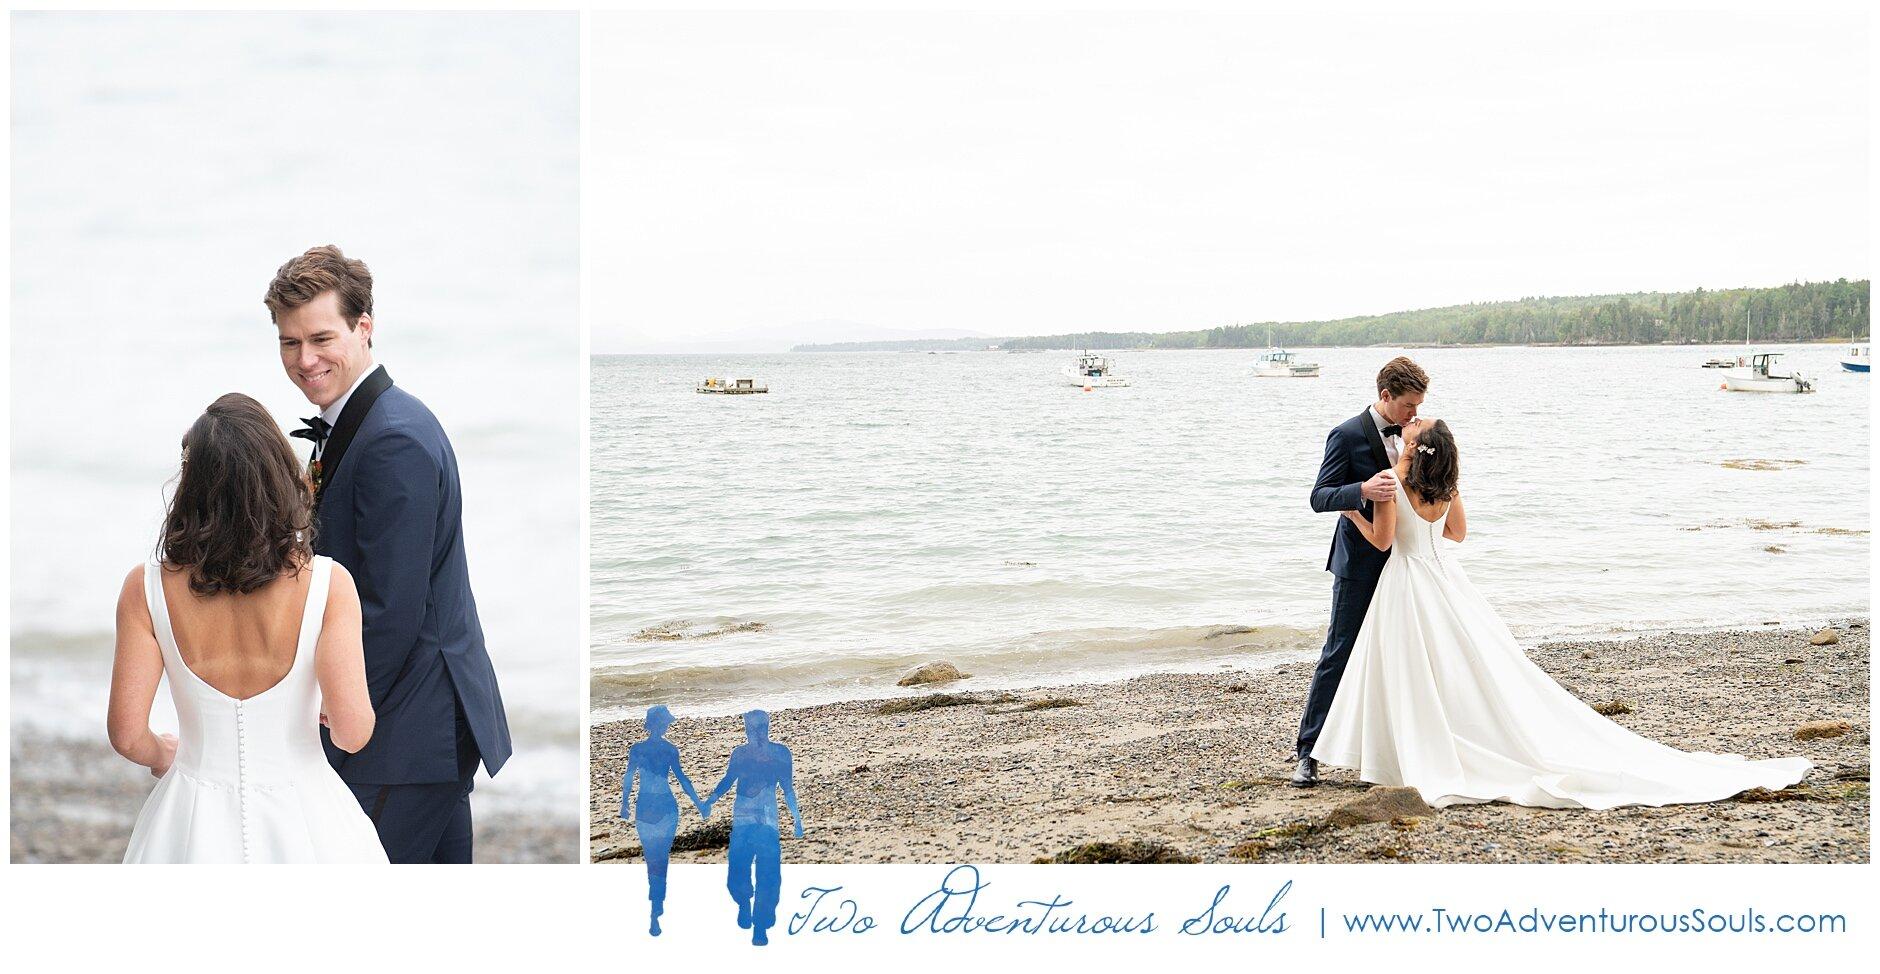 Bar Harbor Wedding Photographers, Acadia Bay Inn Wedding Photographers, Two Adventurous Souls- 091419_0011.jpg